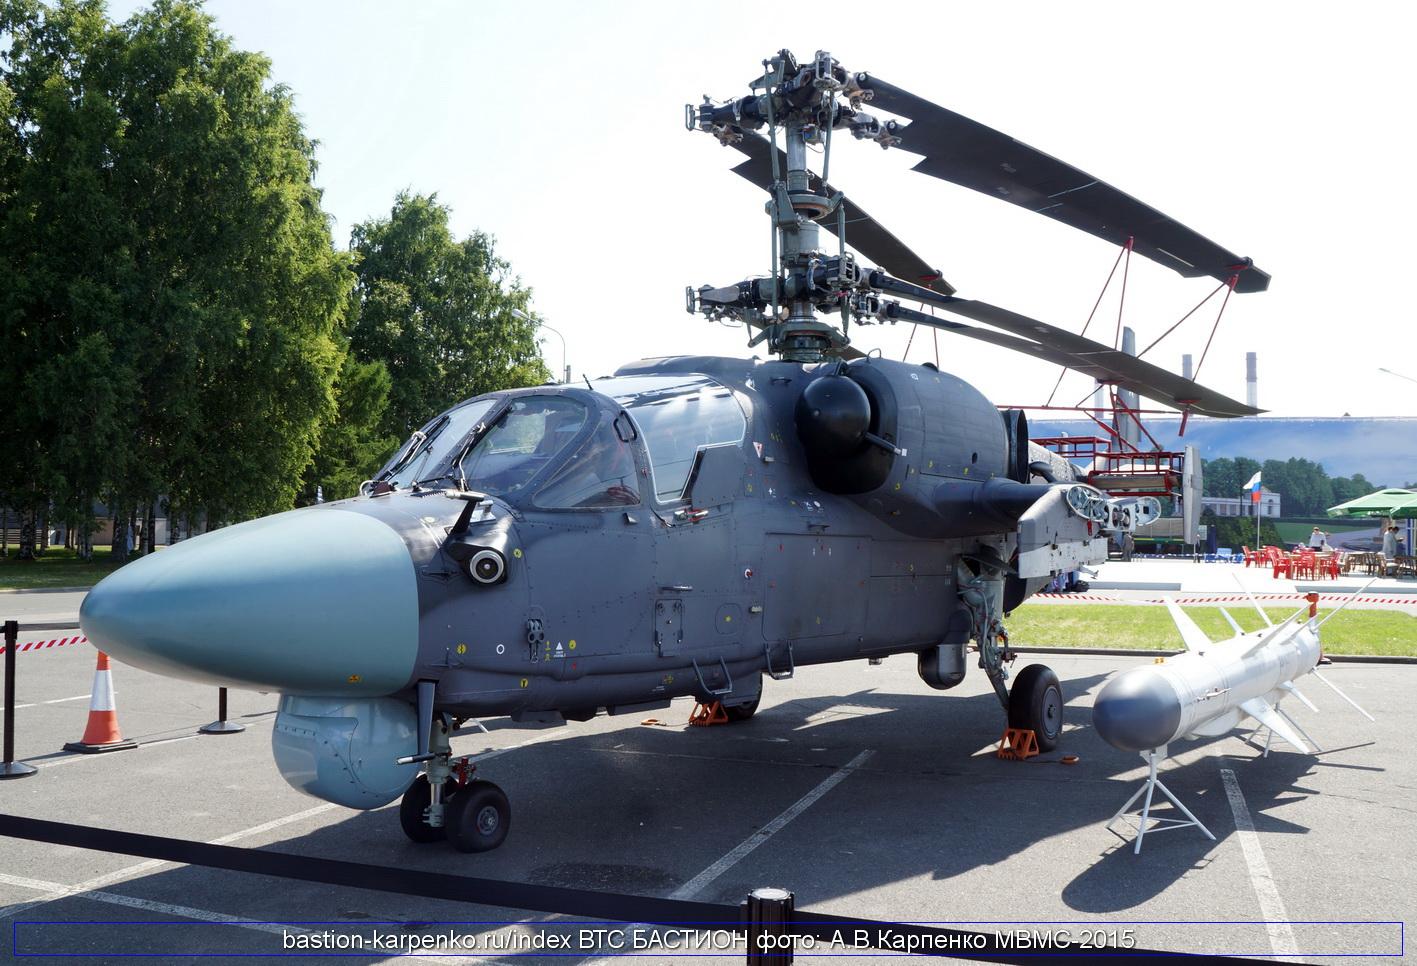 Ka-52K for Russian Navy - Page 2 KA-52K_MVMS-2015_01